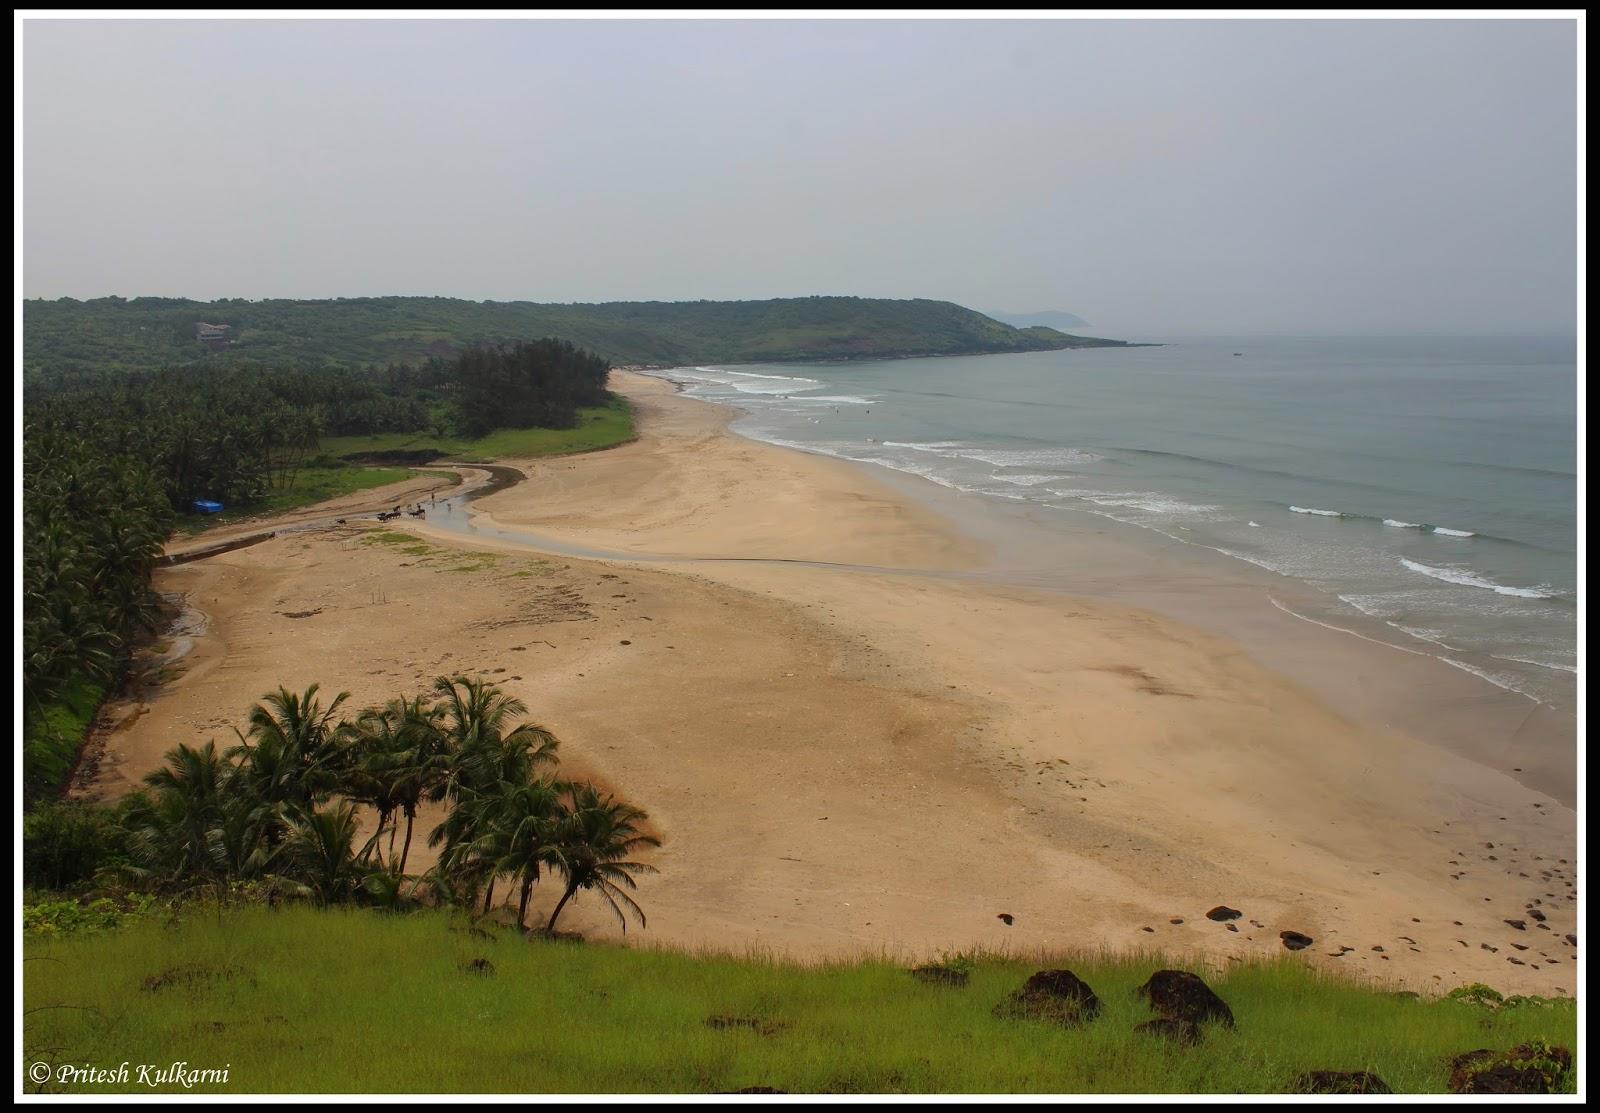 BhandarPule Beach